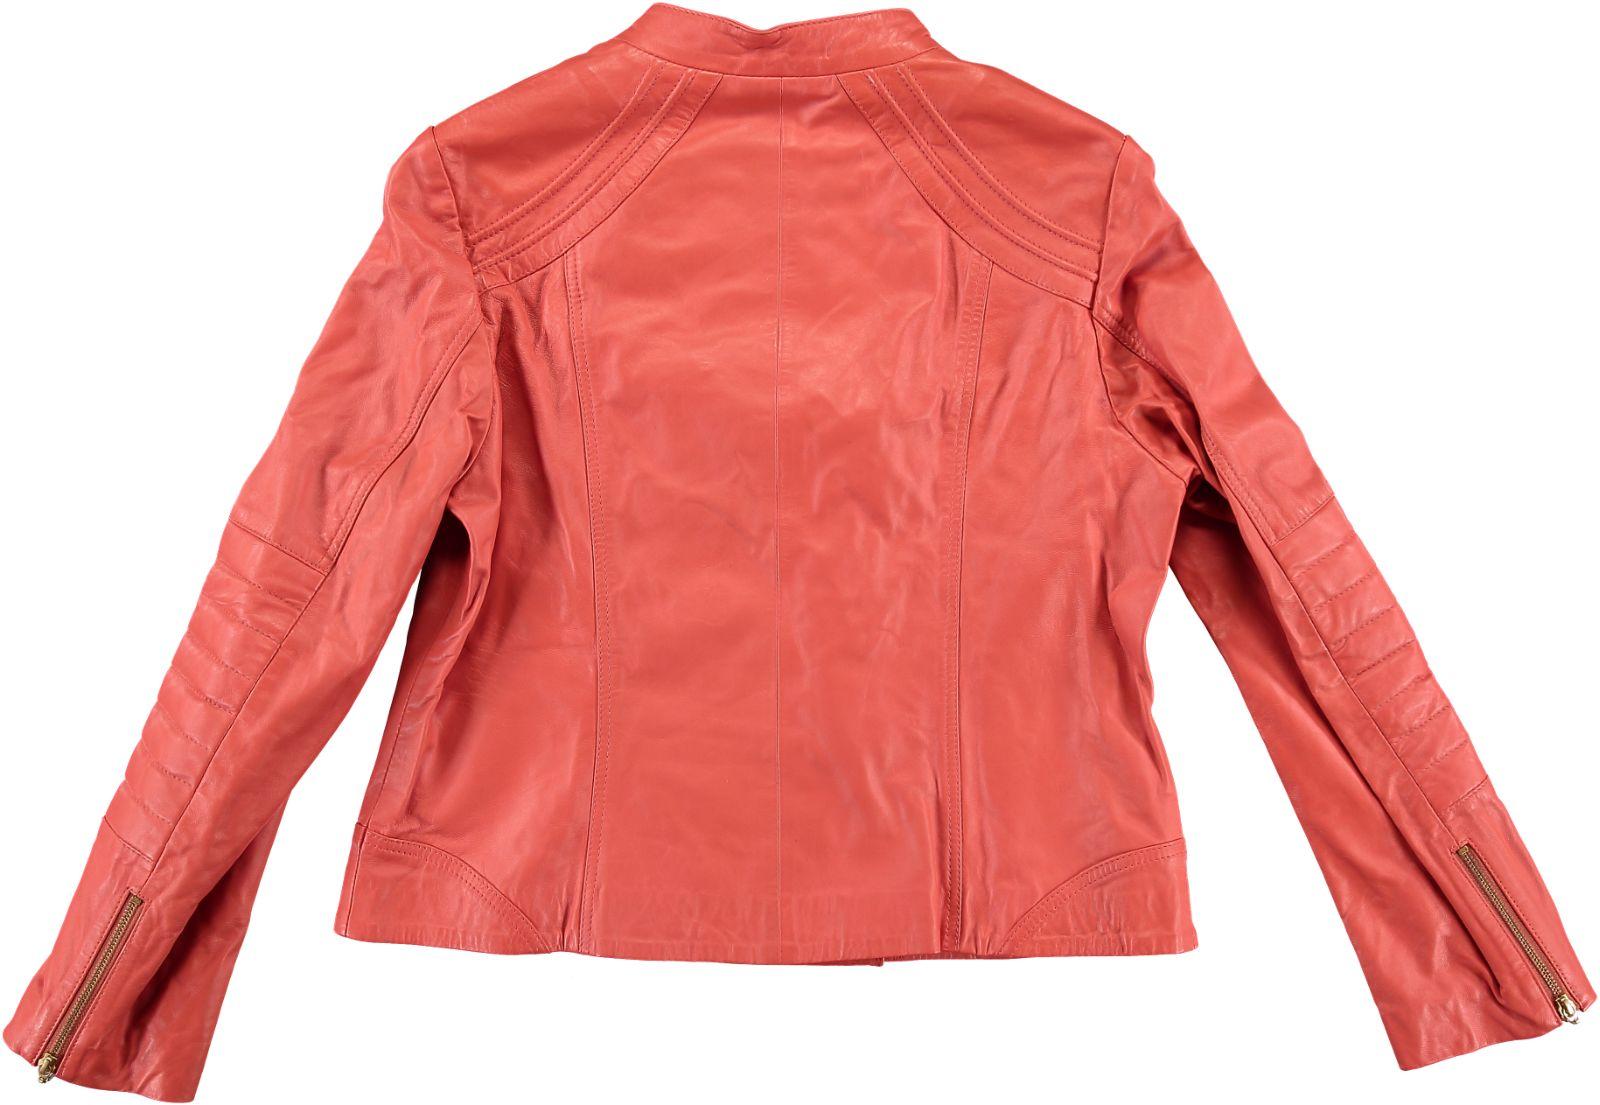 kookai damen jacke lederjacke blazer safran rot gr 44 xxl. Black Bedroom Furniture Sets. Home Design Ideas